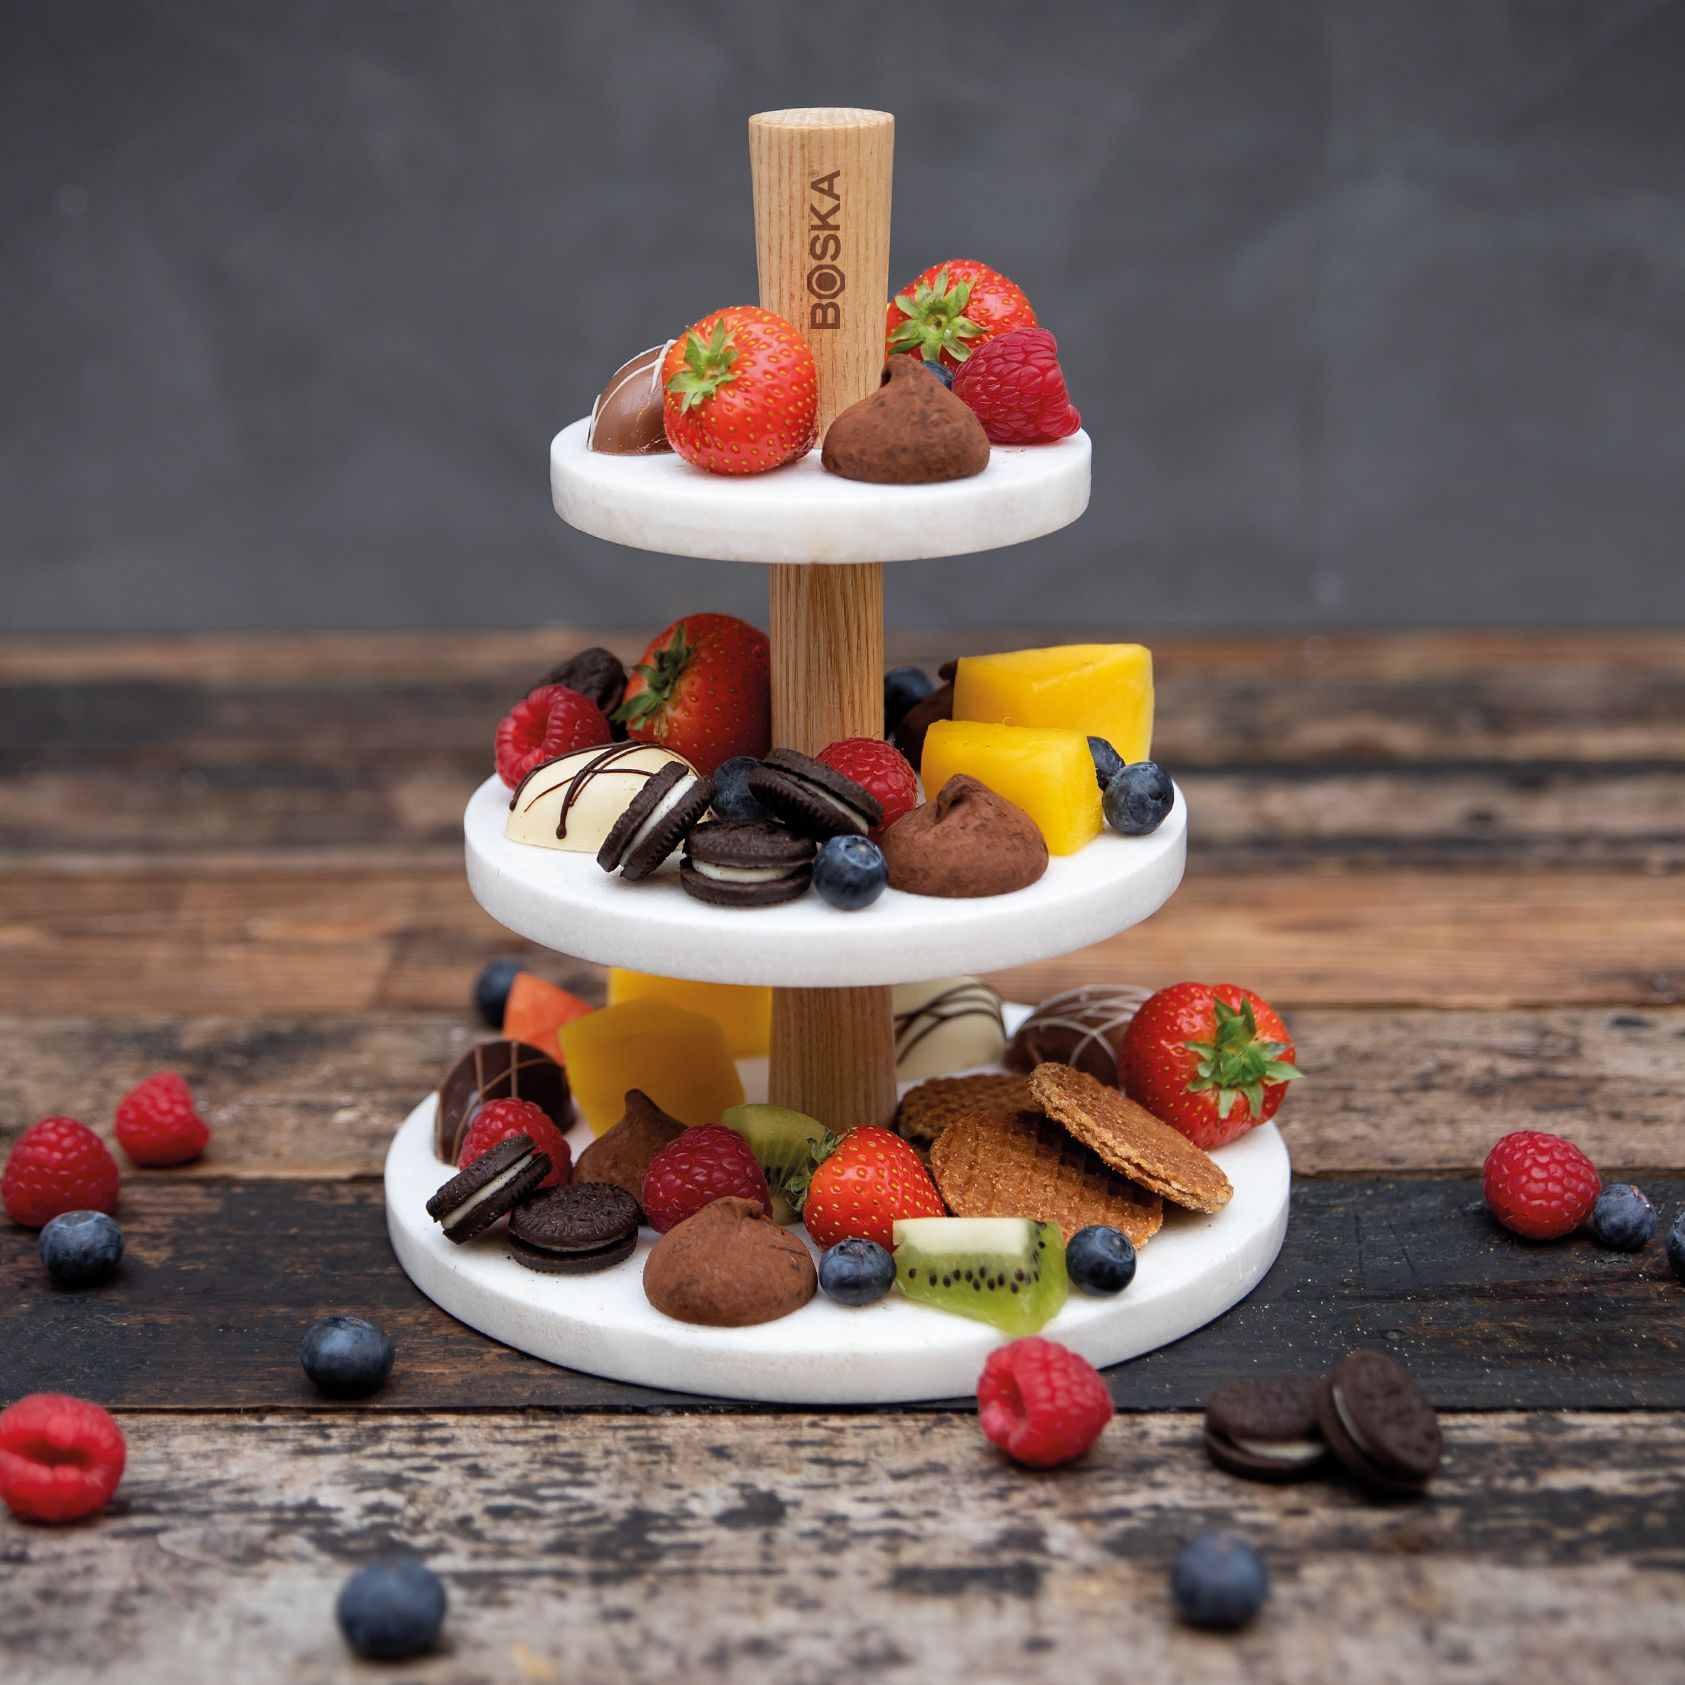 Choco Tower Tiered Serving Trays Savory Snacks Choco